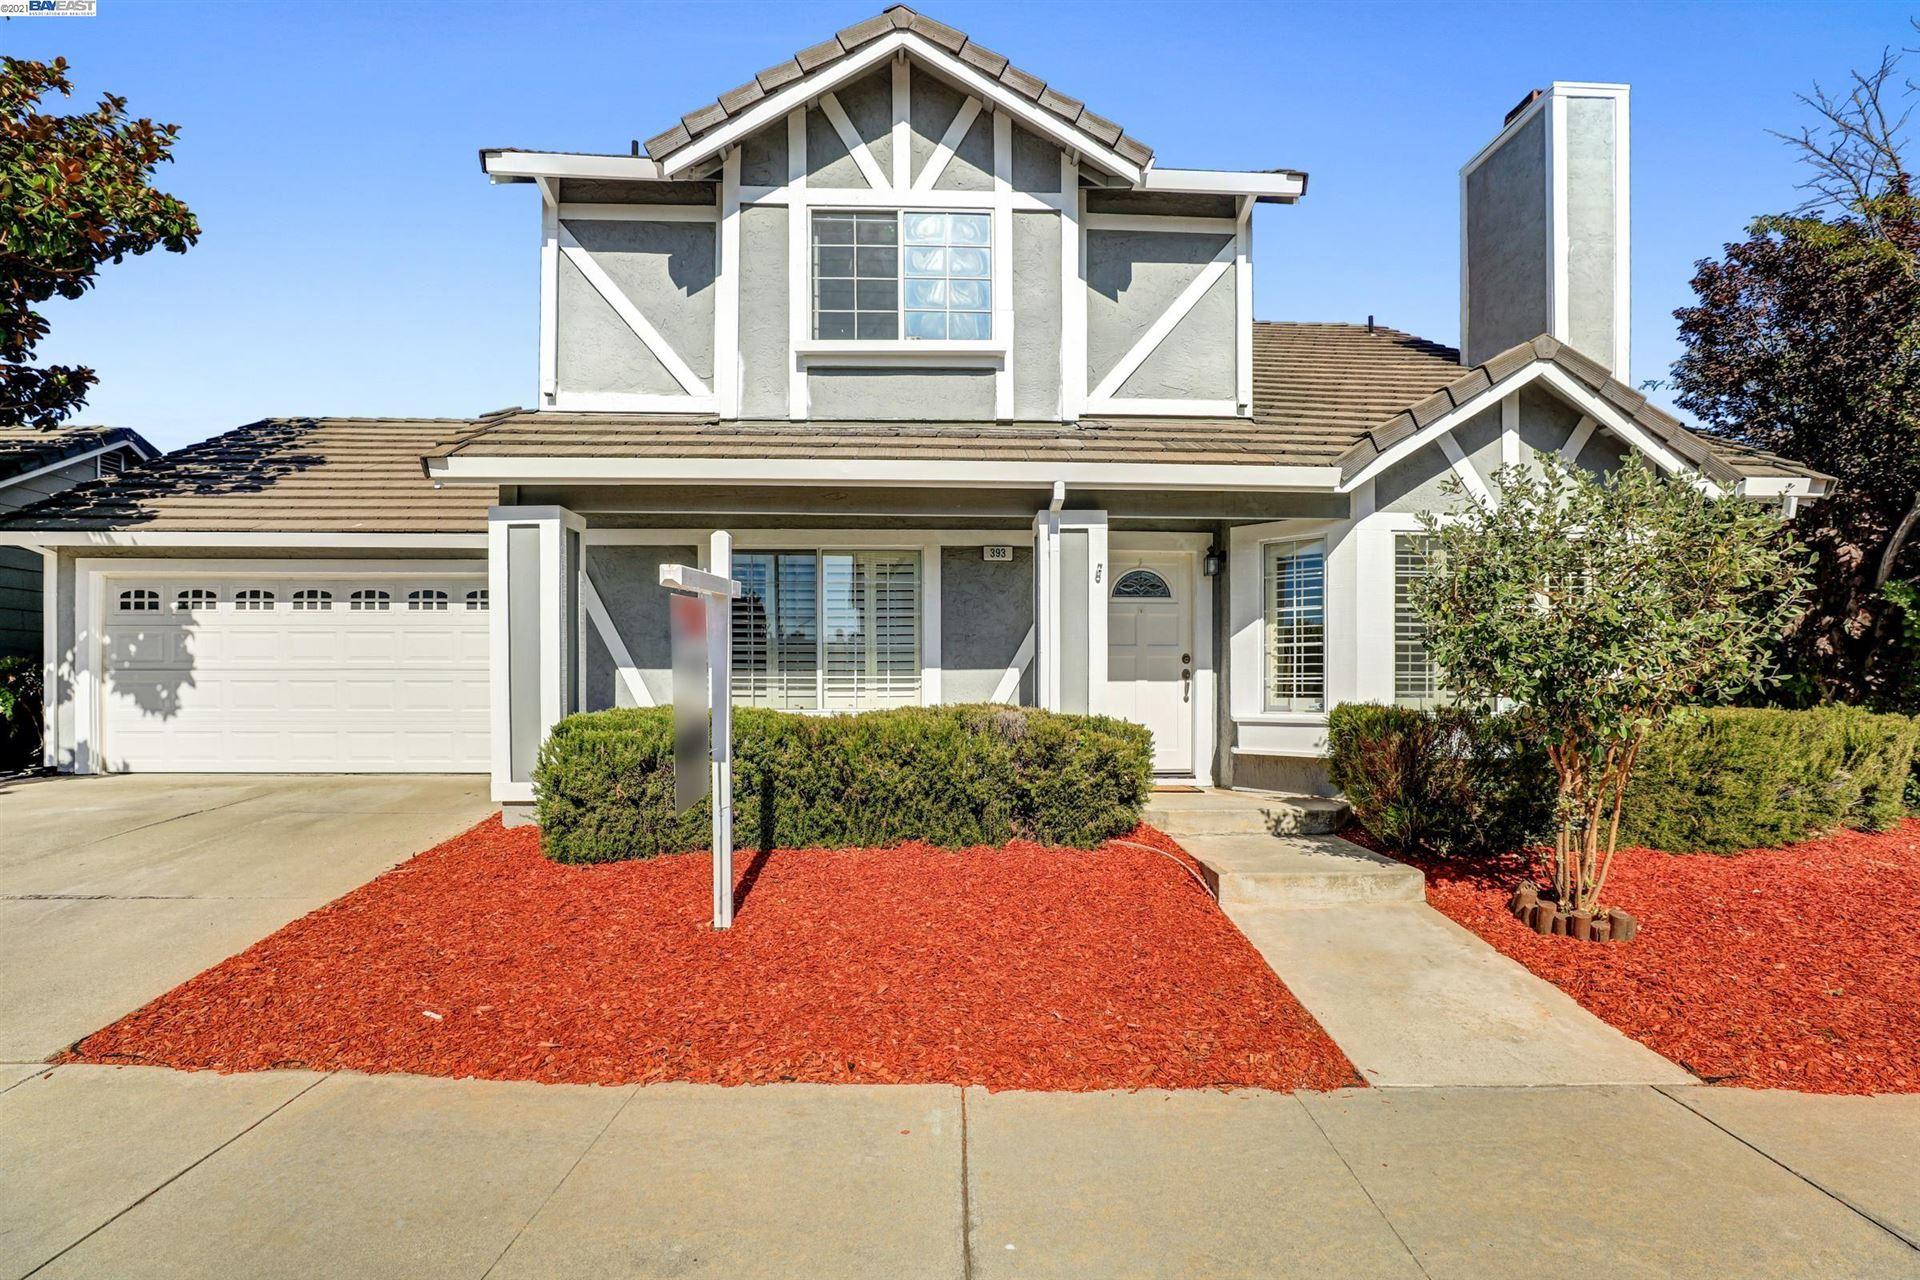 393 Stonebridge Dr, Fremont, CA 94536 - #: 40967243